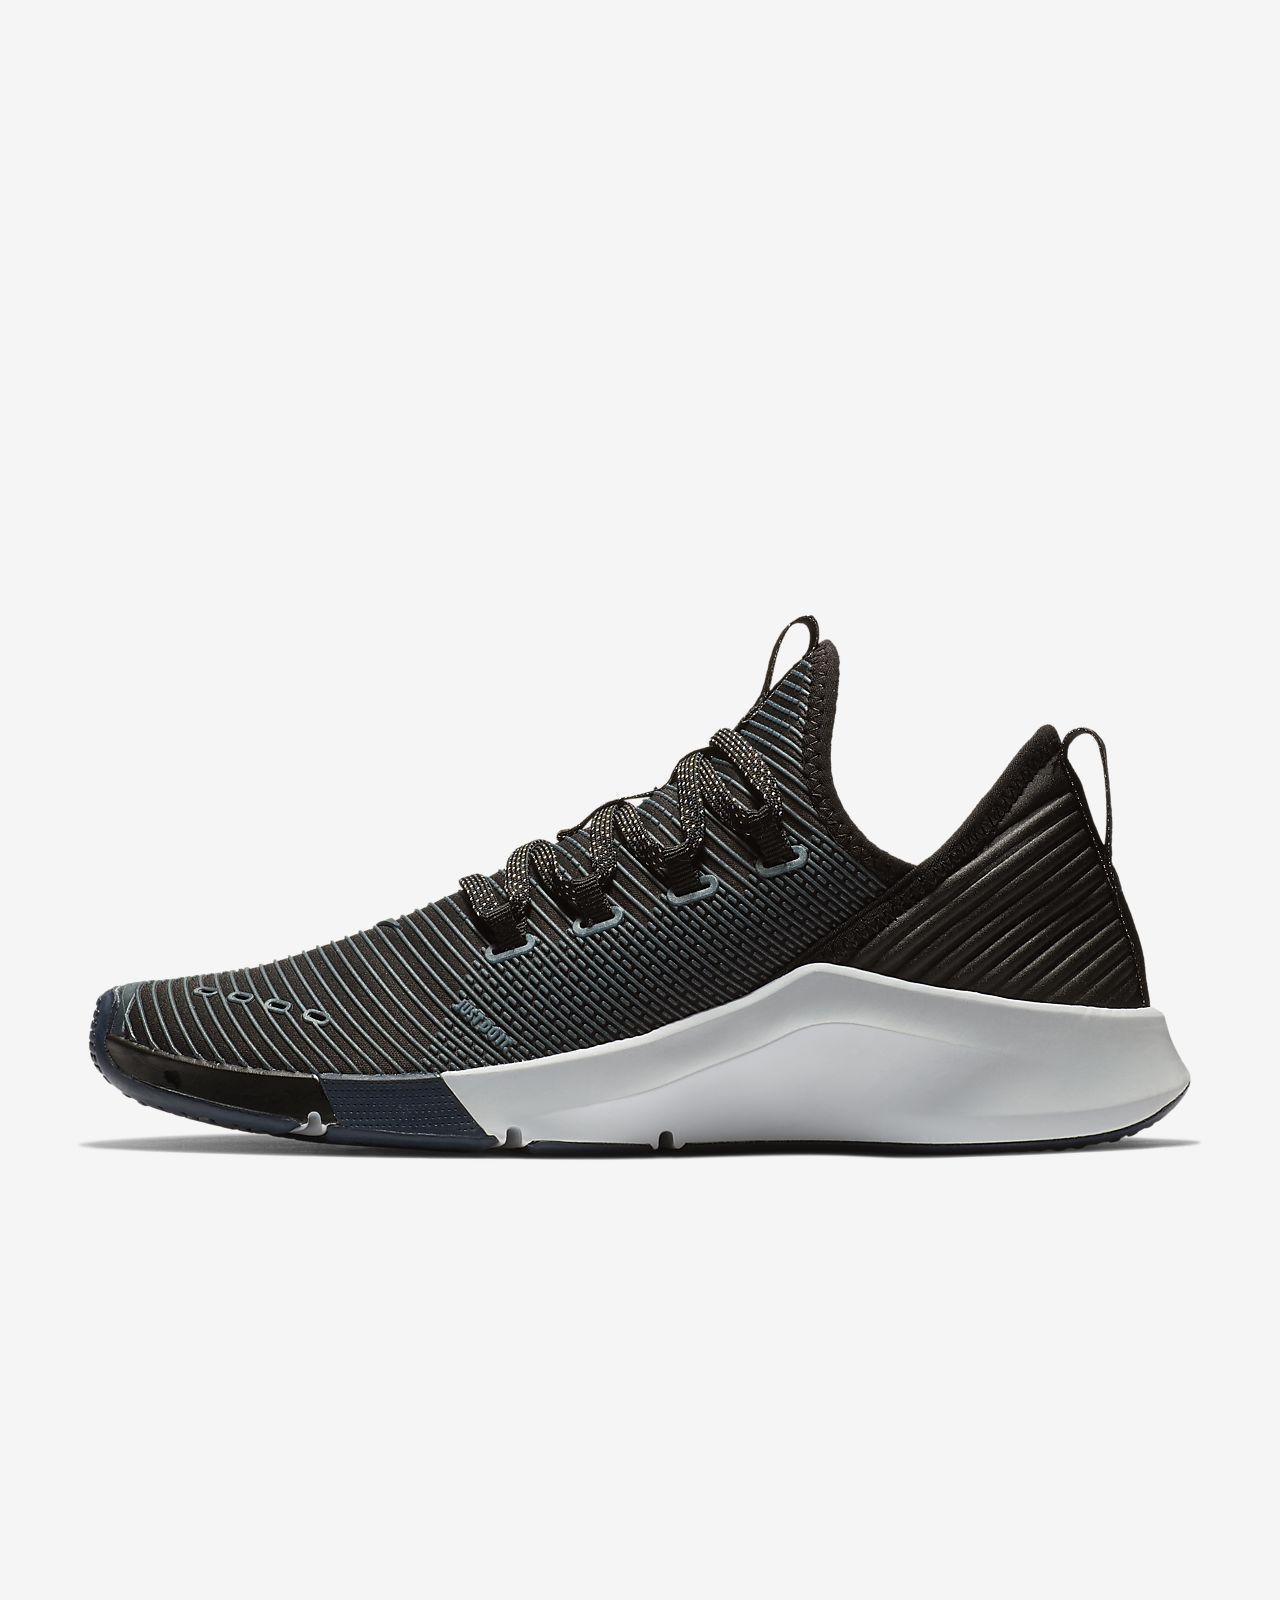 buy popular b7646 b4b32 Chaussure de training Nike Air Zoom Elevate Metallic pour Femme